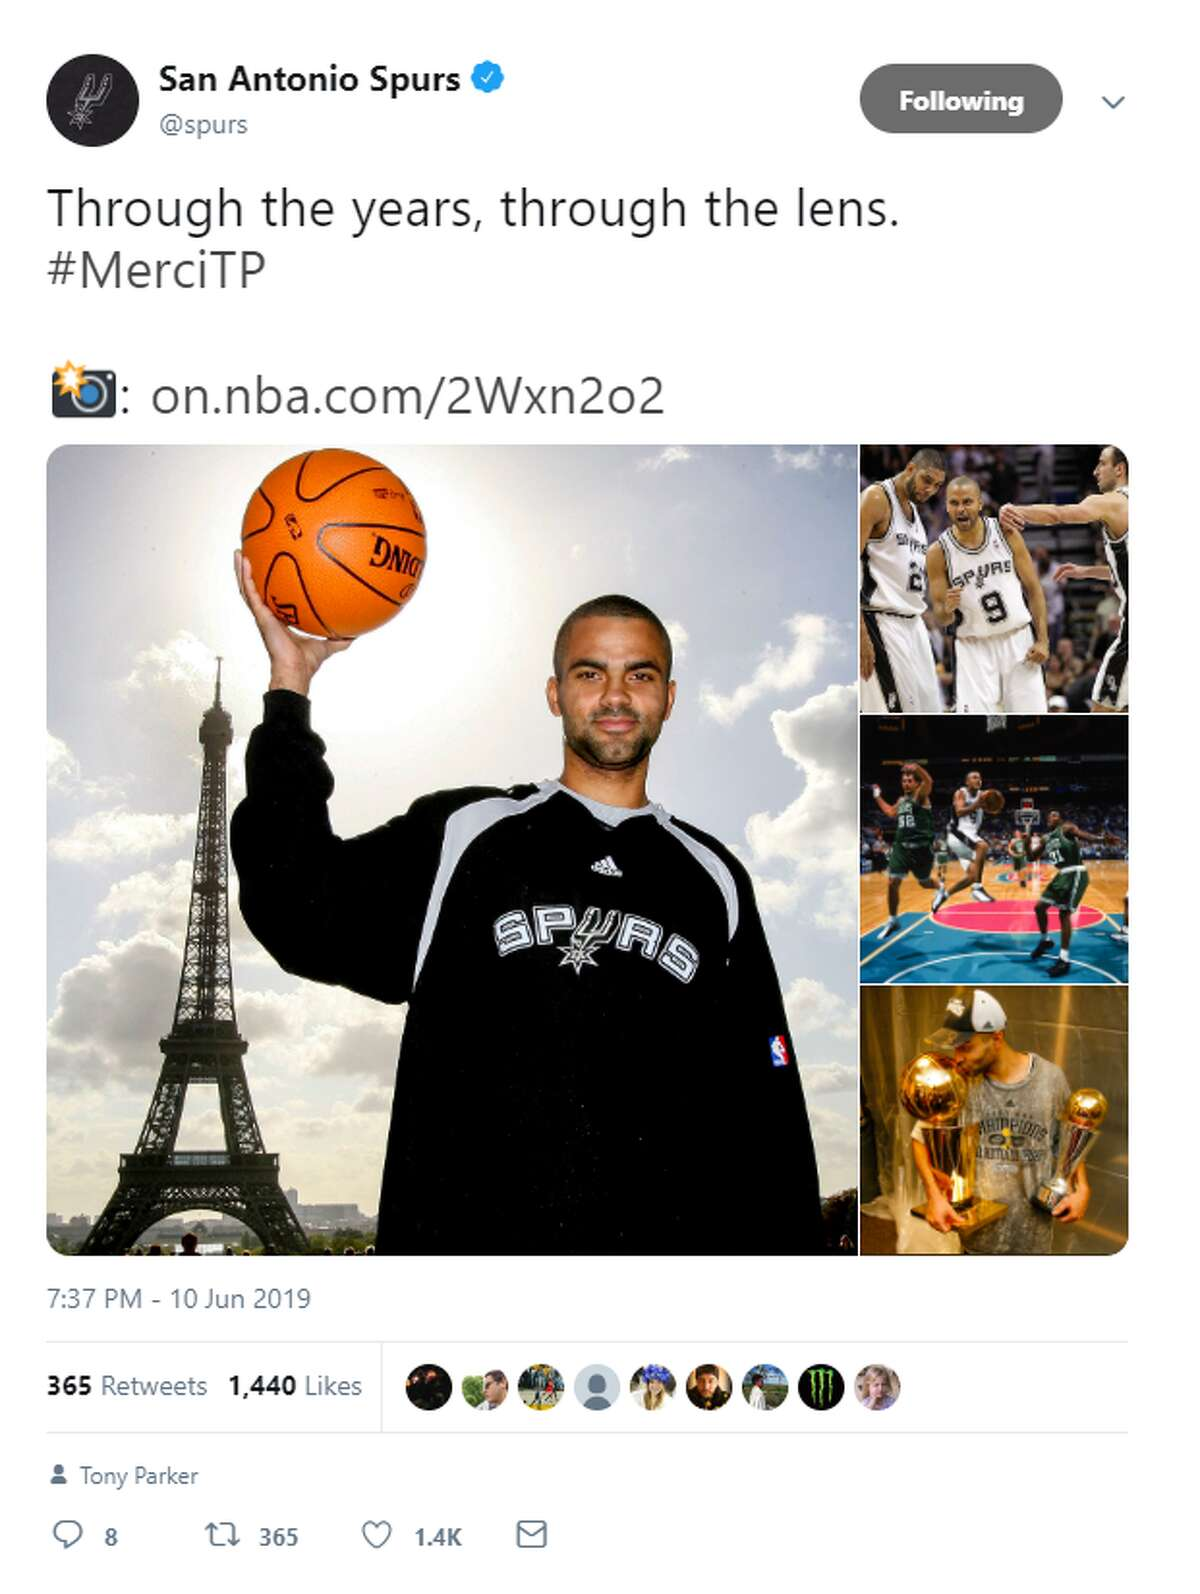 San Antonio Spurs @spurs Through the years, through the lens. #MerciTP